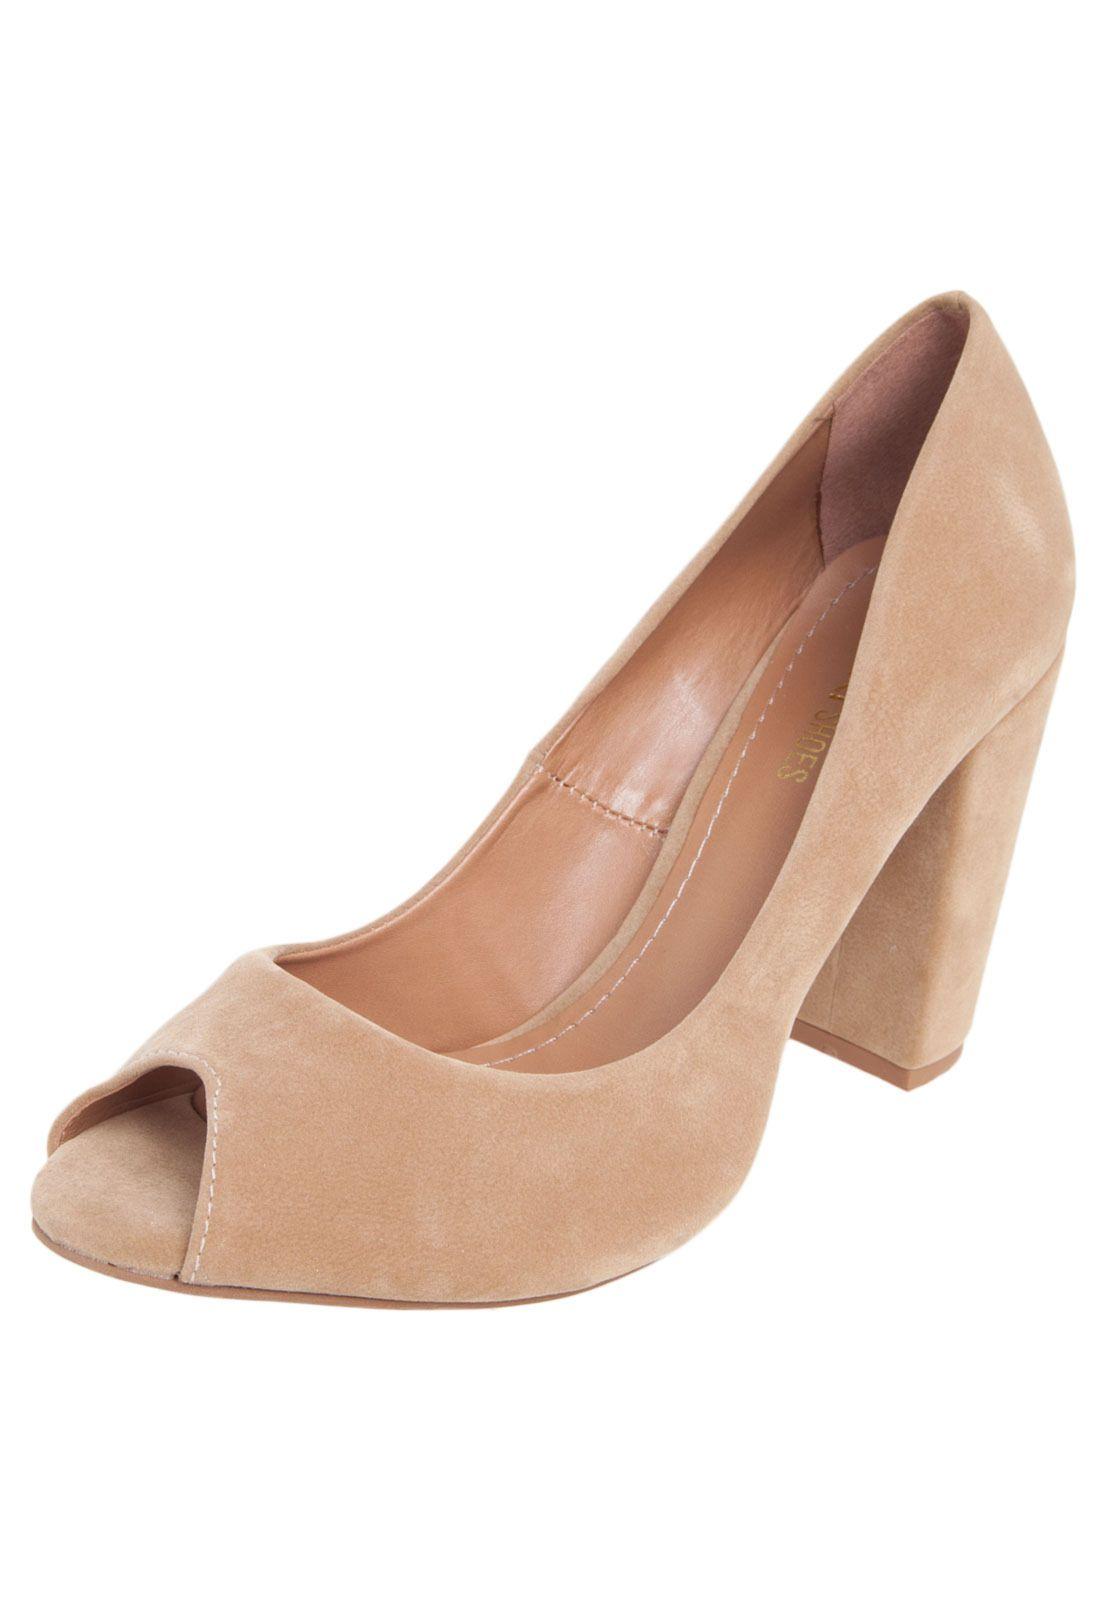 696b8573d Peep Toe DAFITI SHOES Bege   Shoes   Pinterest   Moda evangelica ...